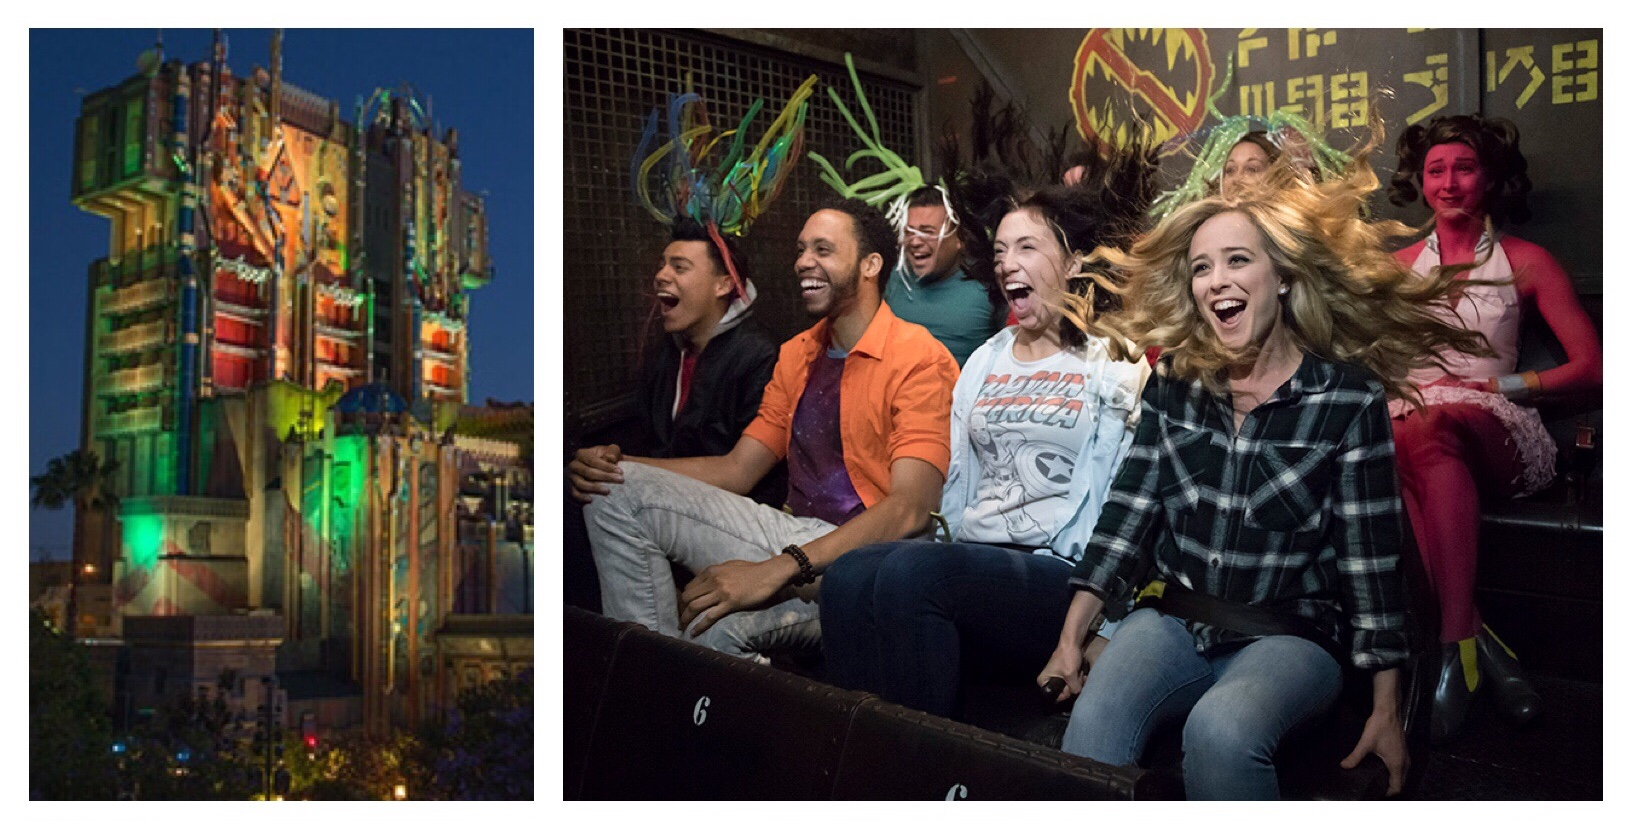 Guardians of the Galaxy - Mission BREAKOUT! at Disney California Adventure / Disneyland resort - Anaheim, California